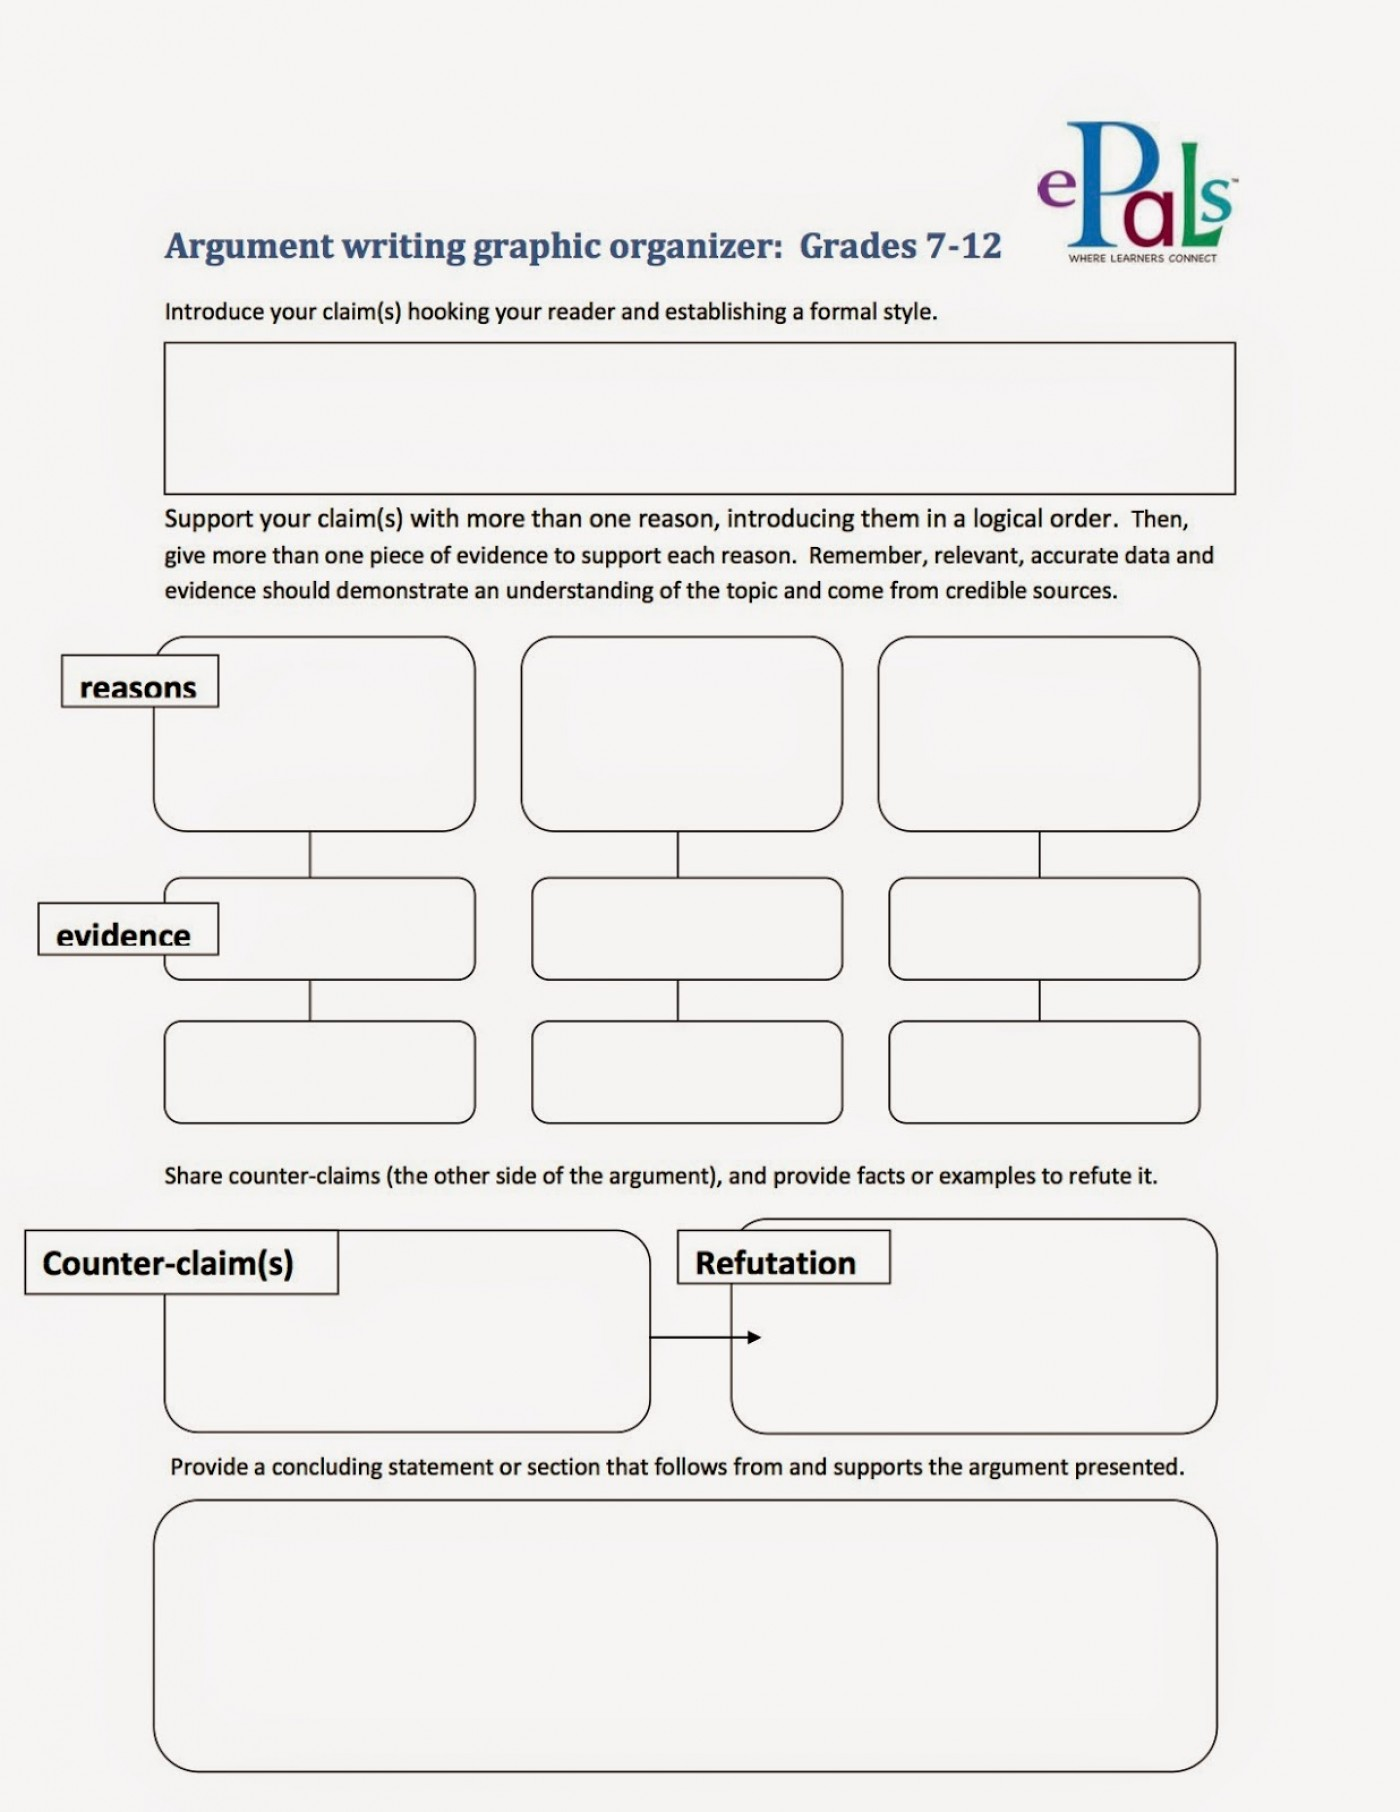 005 Argumentgraphicorganizer2bcopy Argument Essay Graphic Organizer Breathtaking Argumentative College Example Persuasive Template 1400